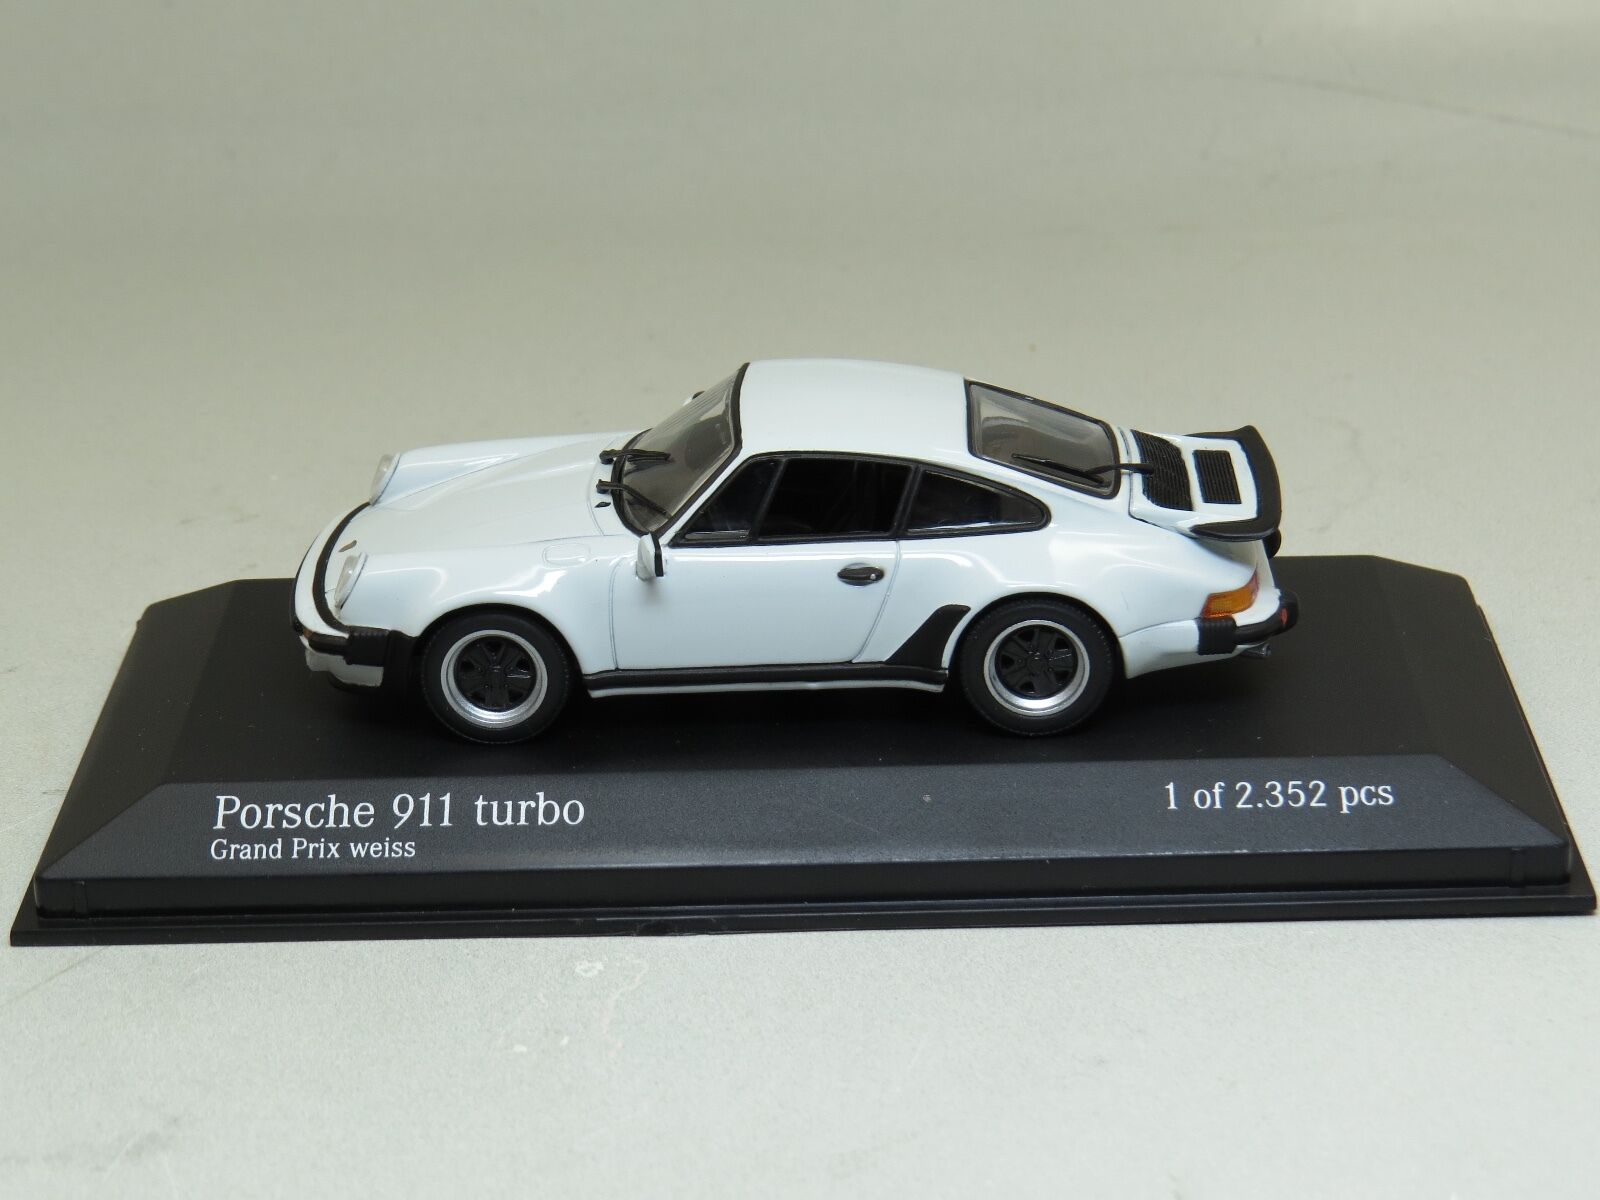 Porsche 911 Turbo Grand Prix Weiss (blanc) 1977 Minichamps 1 43